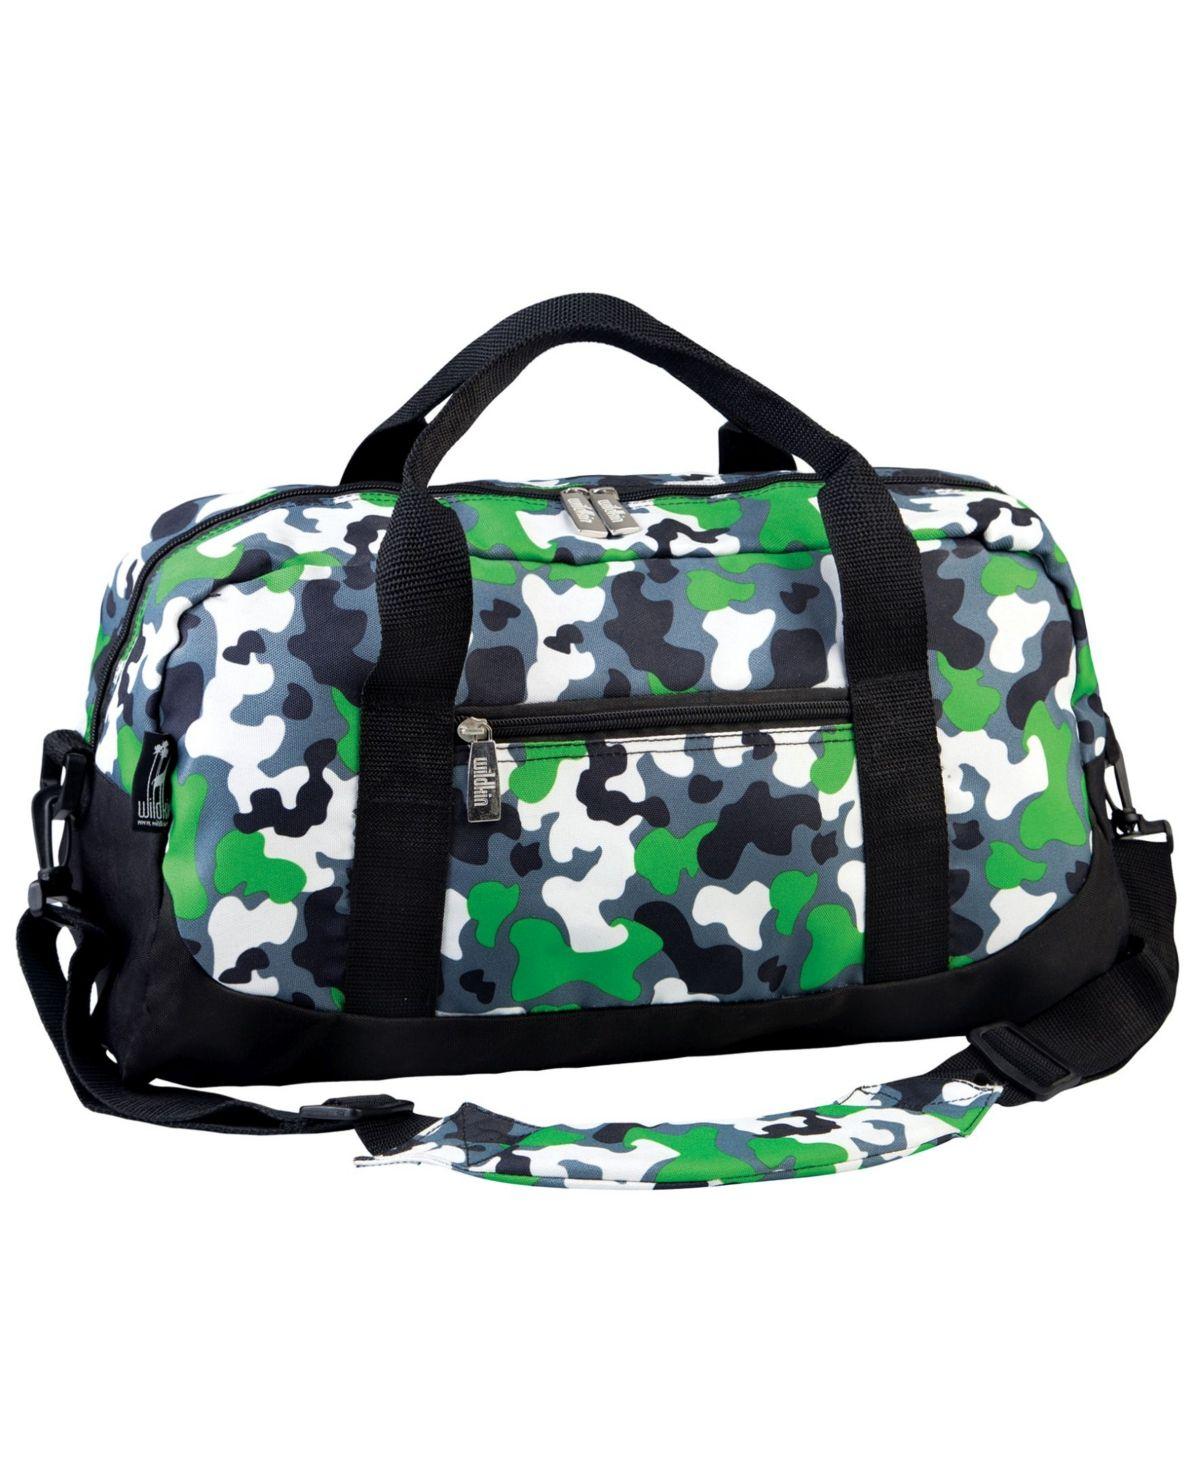 Green Camo Messenger Bag Personalized